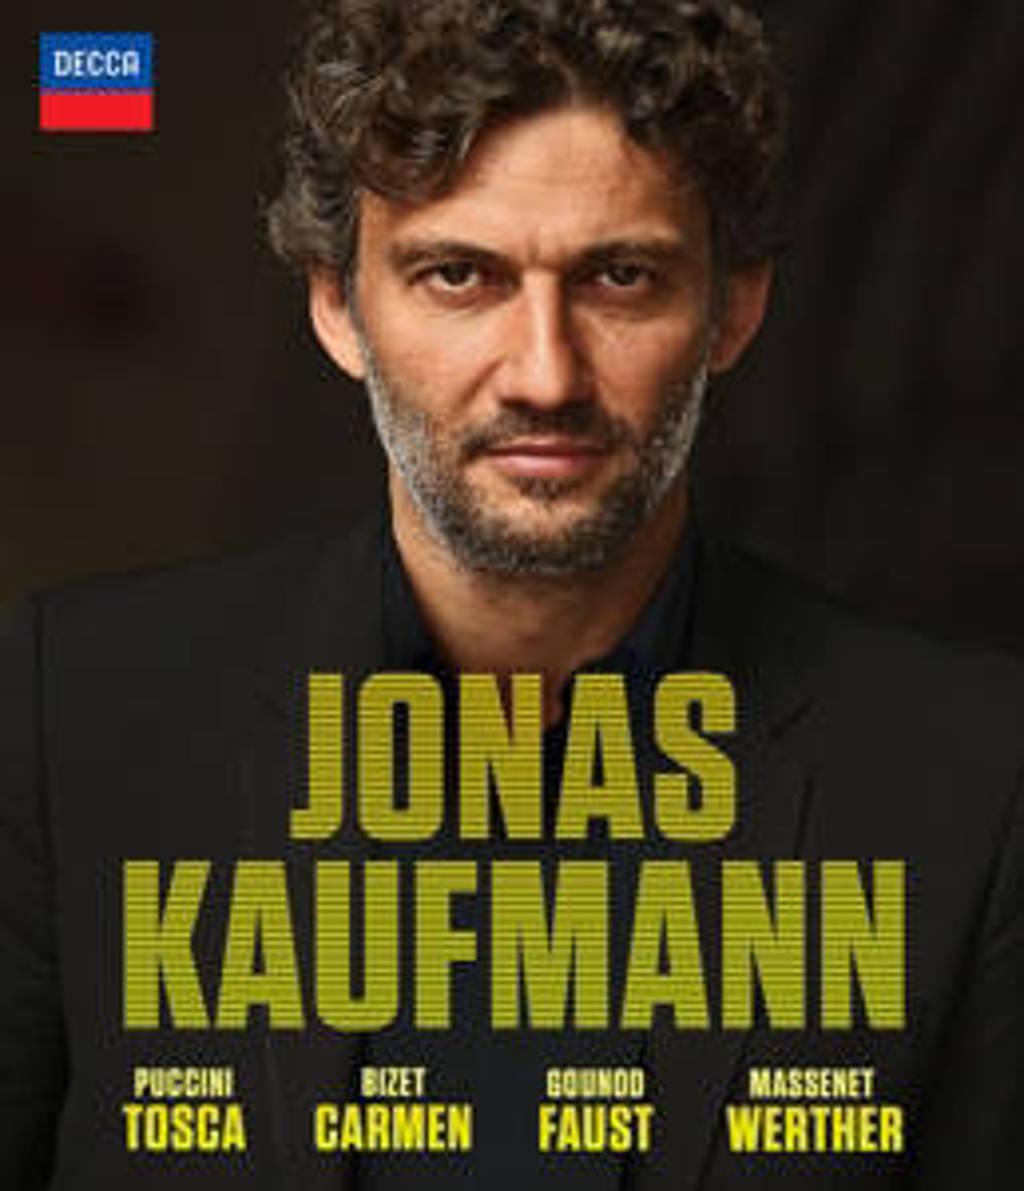 Jonas Kaufmann - Jonas Kaufmann - Carmen - Tosca - F (Blu-ray)